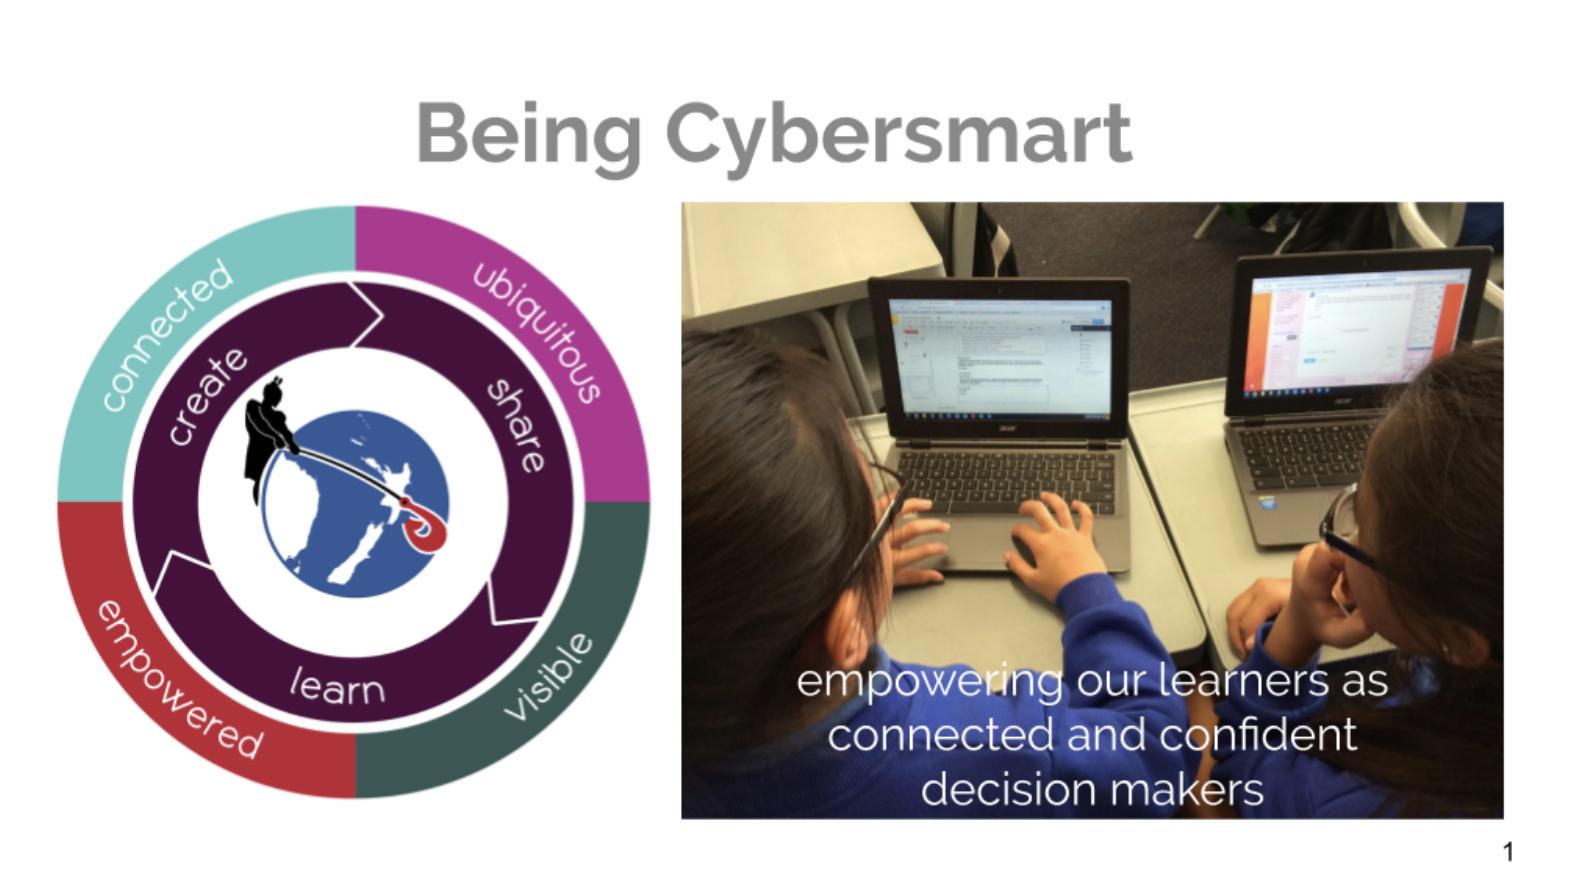 Being Cybersmart